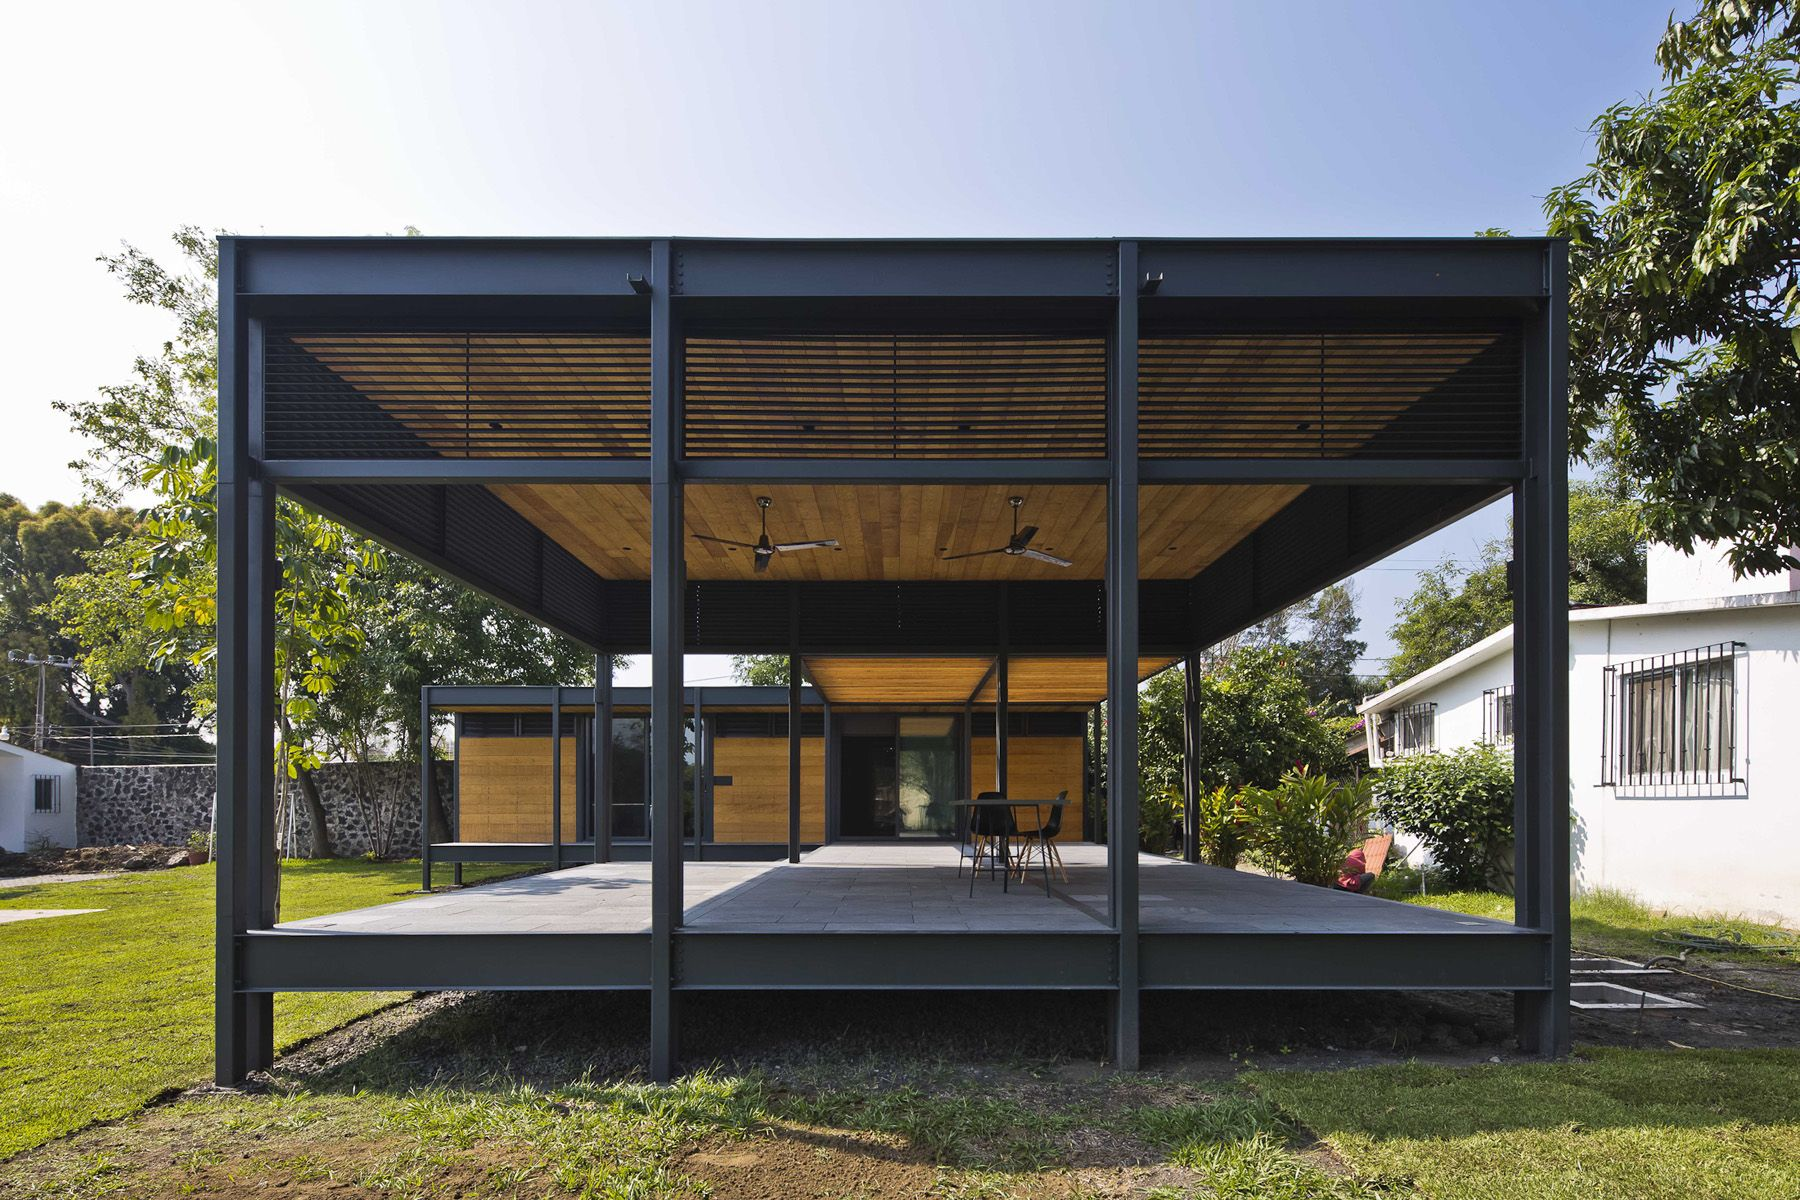 Casa Molina Onnis Luque Casas Estructura Metalica Casas De